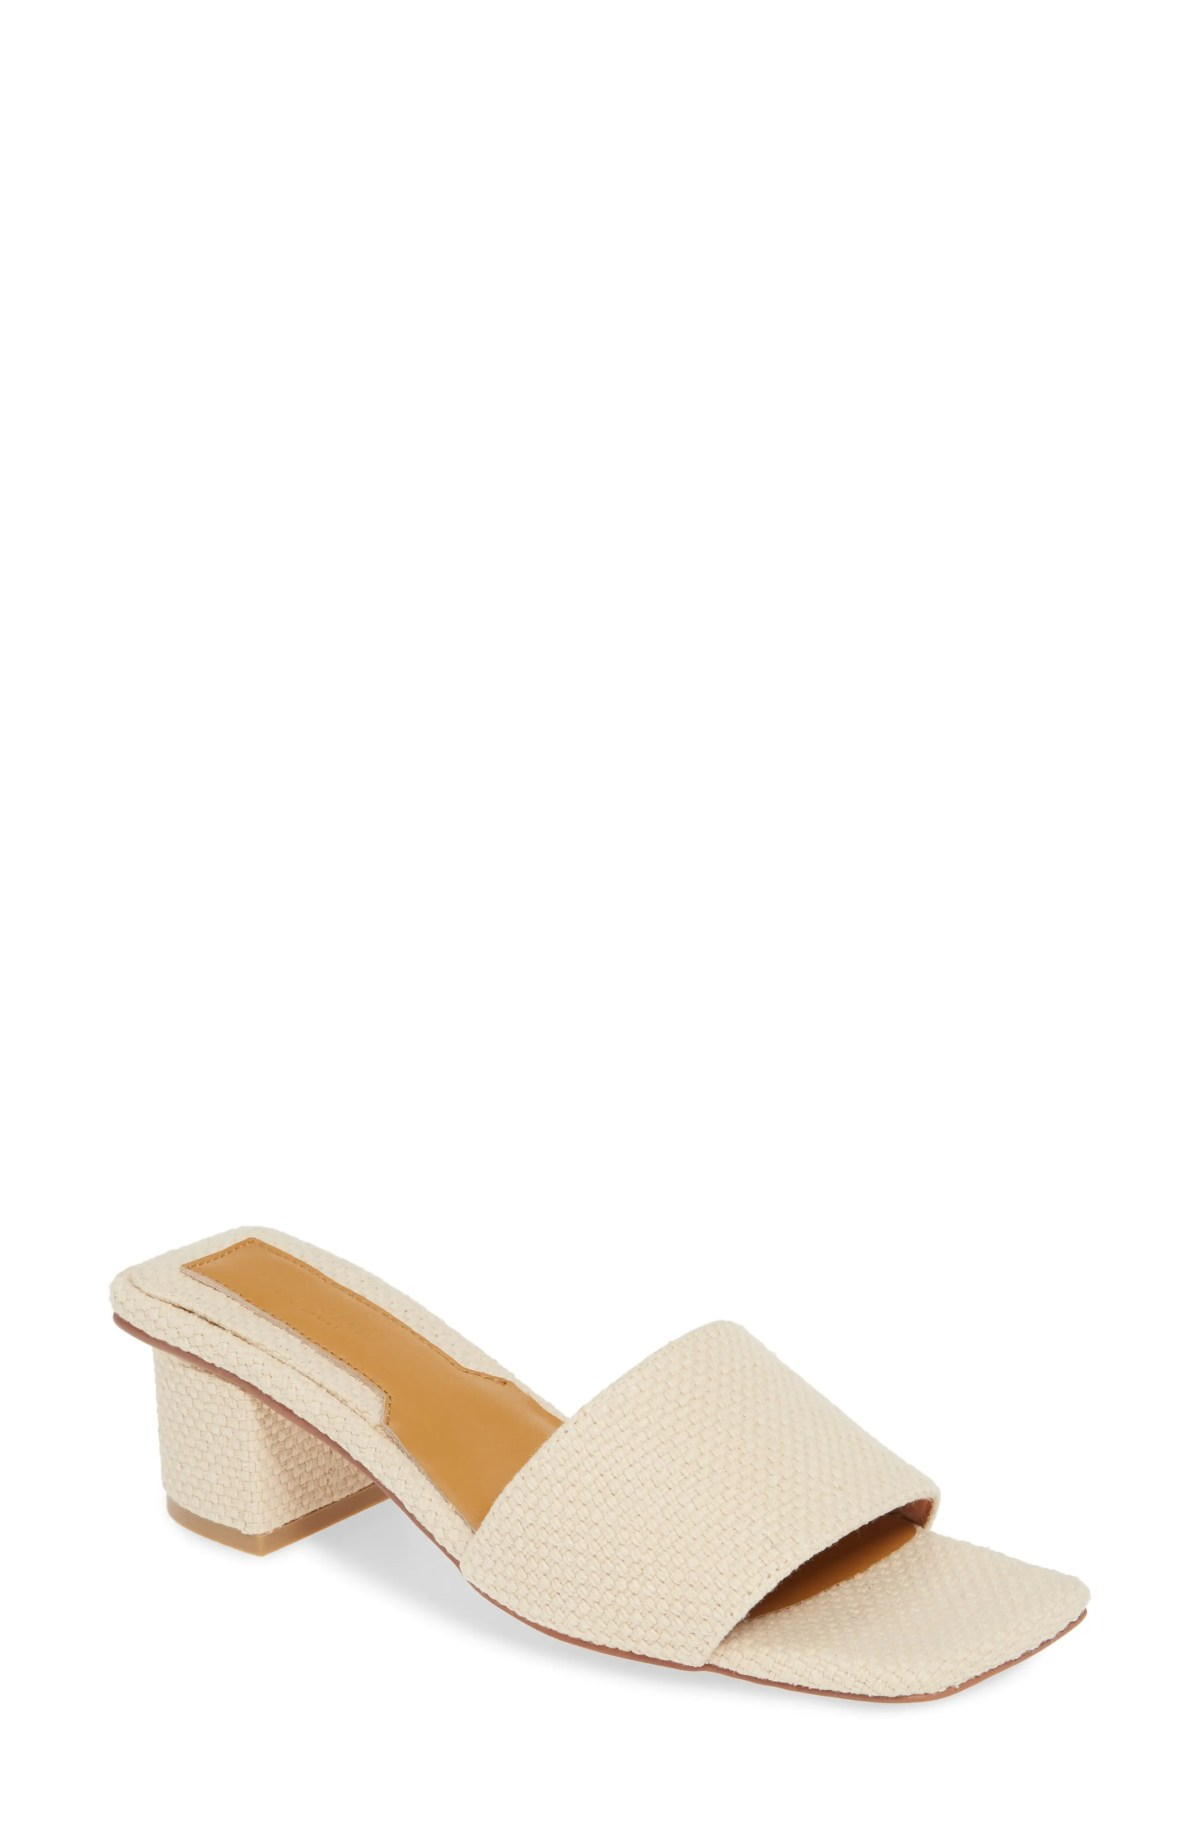 JAGGAR Meadow Woven Slide Sandal, Main, color, NATURAL FABRIC